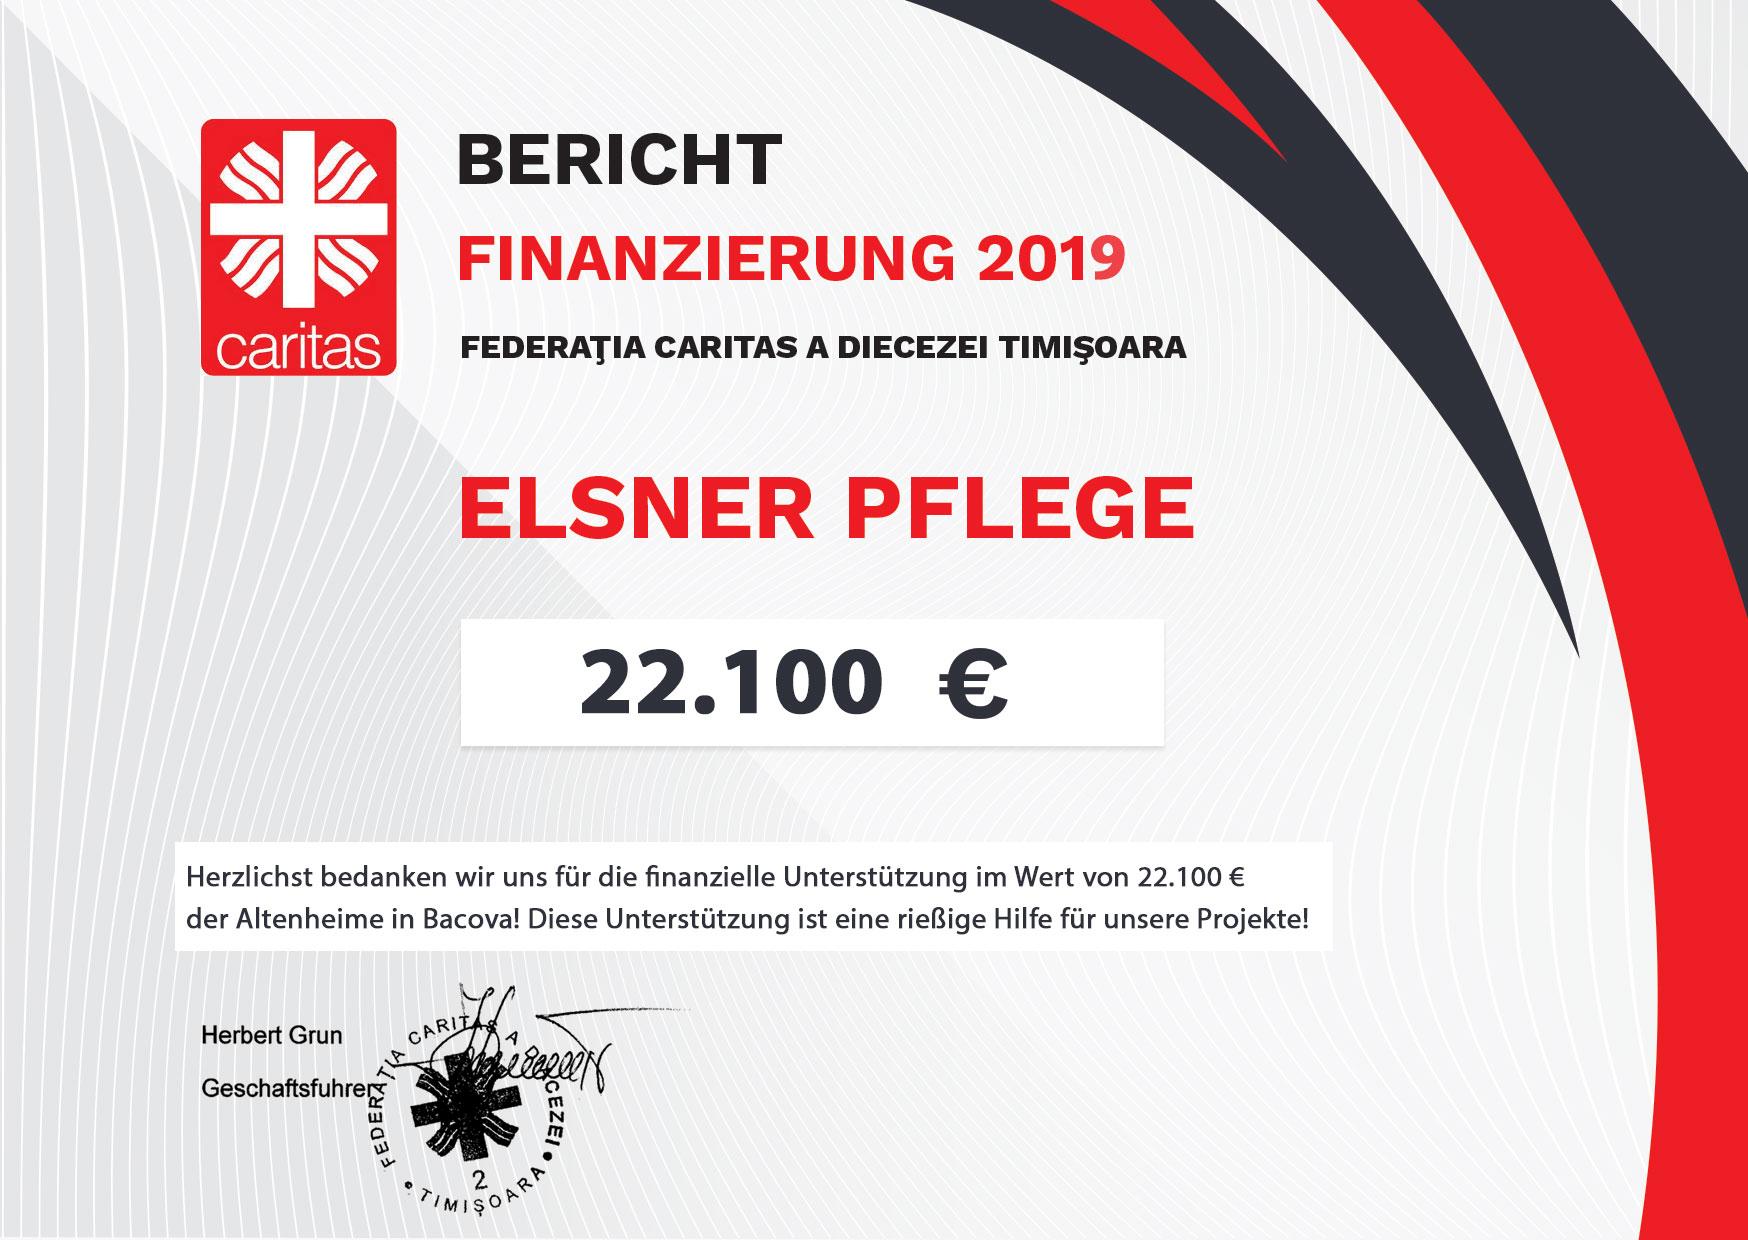 Caritas Bericht Finanzierung 2019 Elsner Pflege